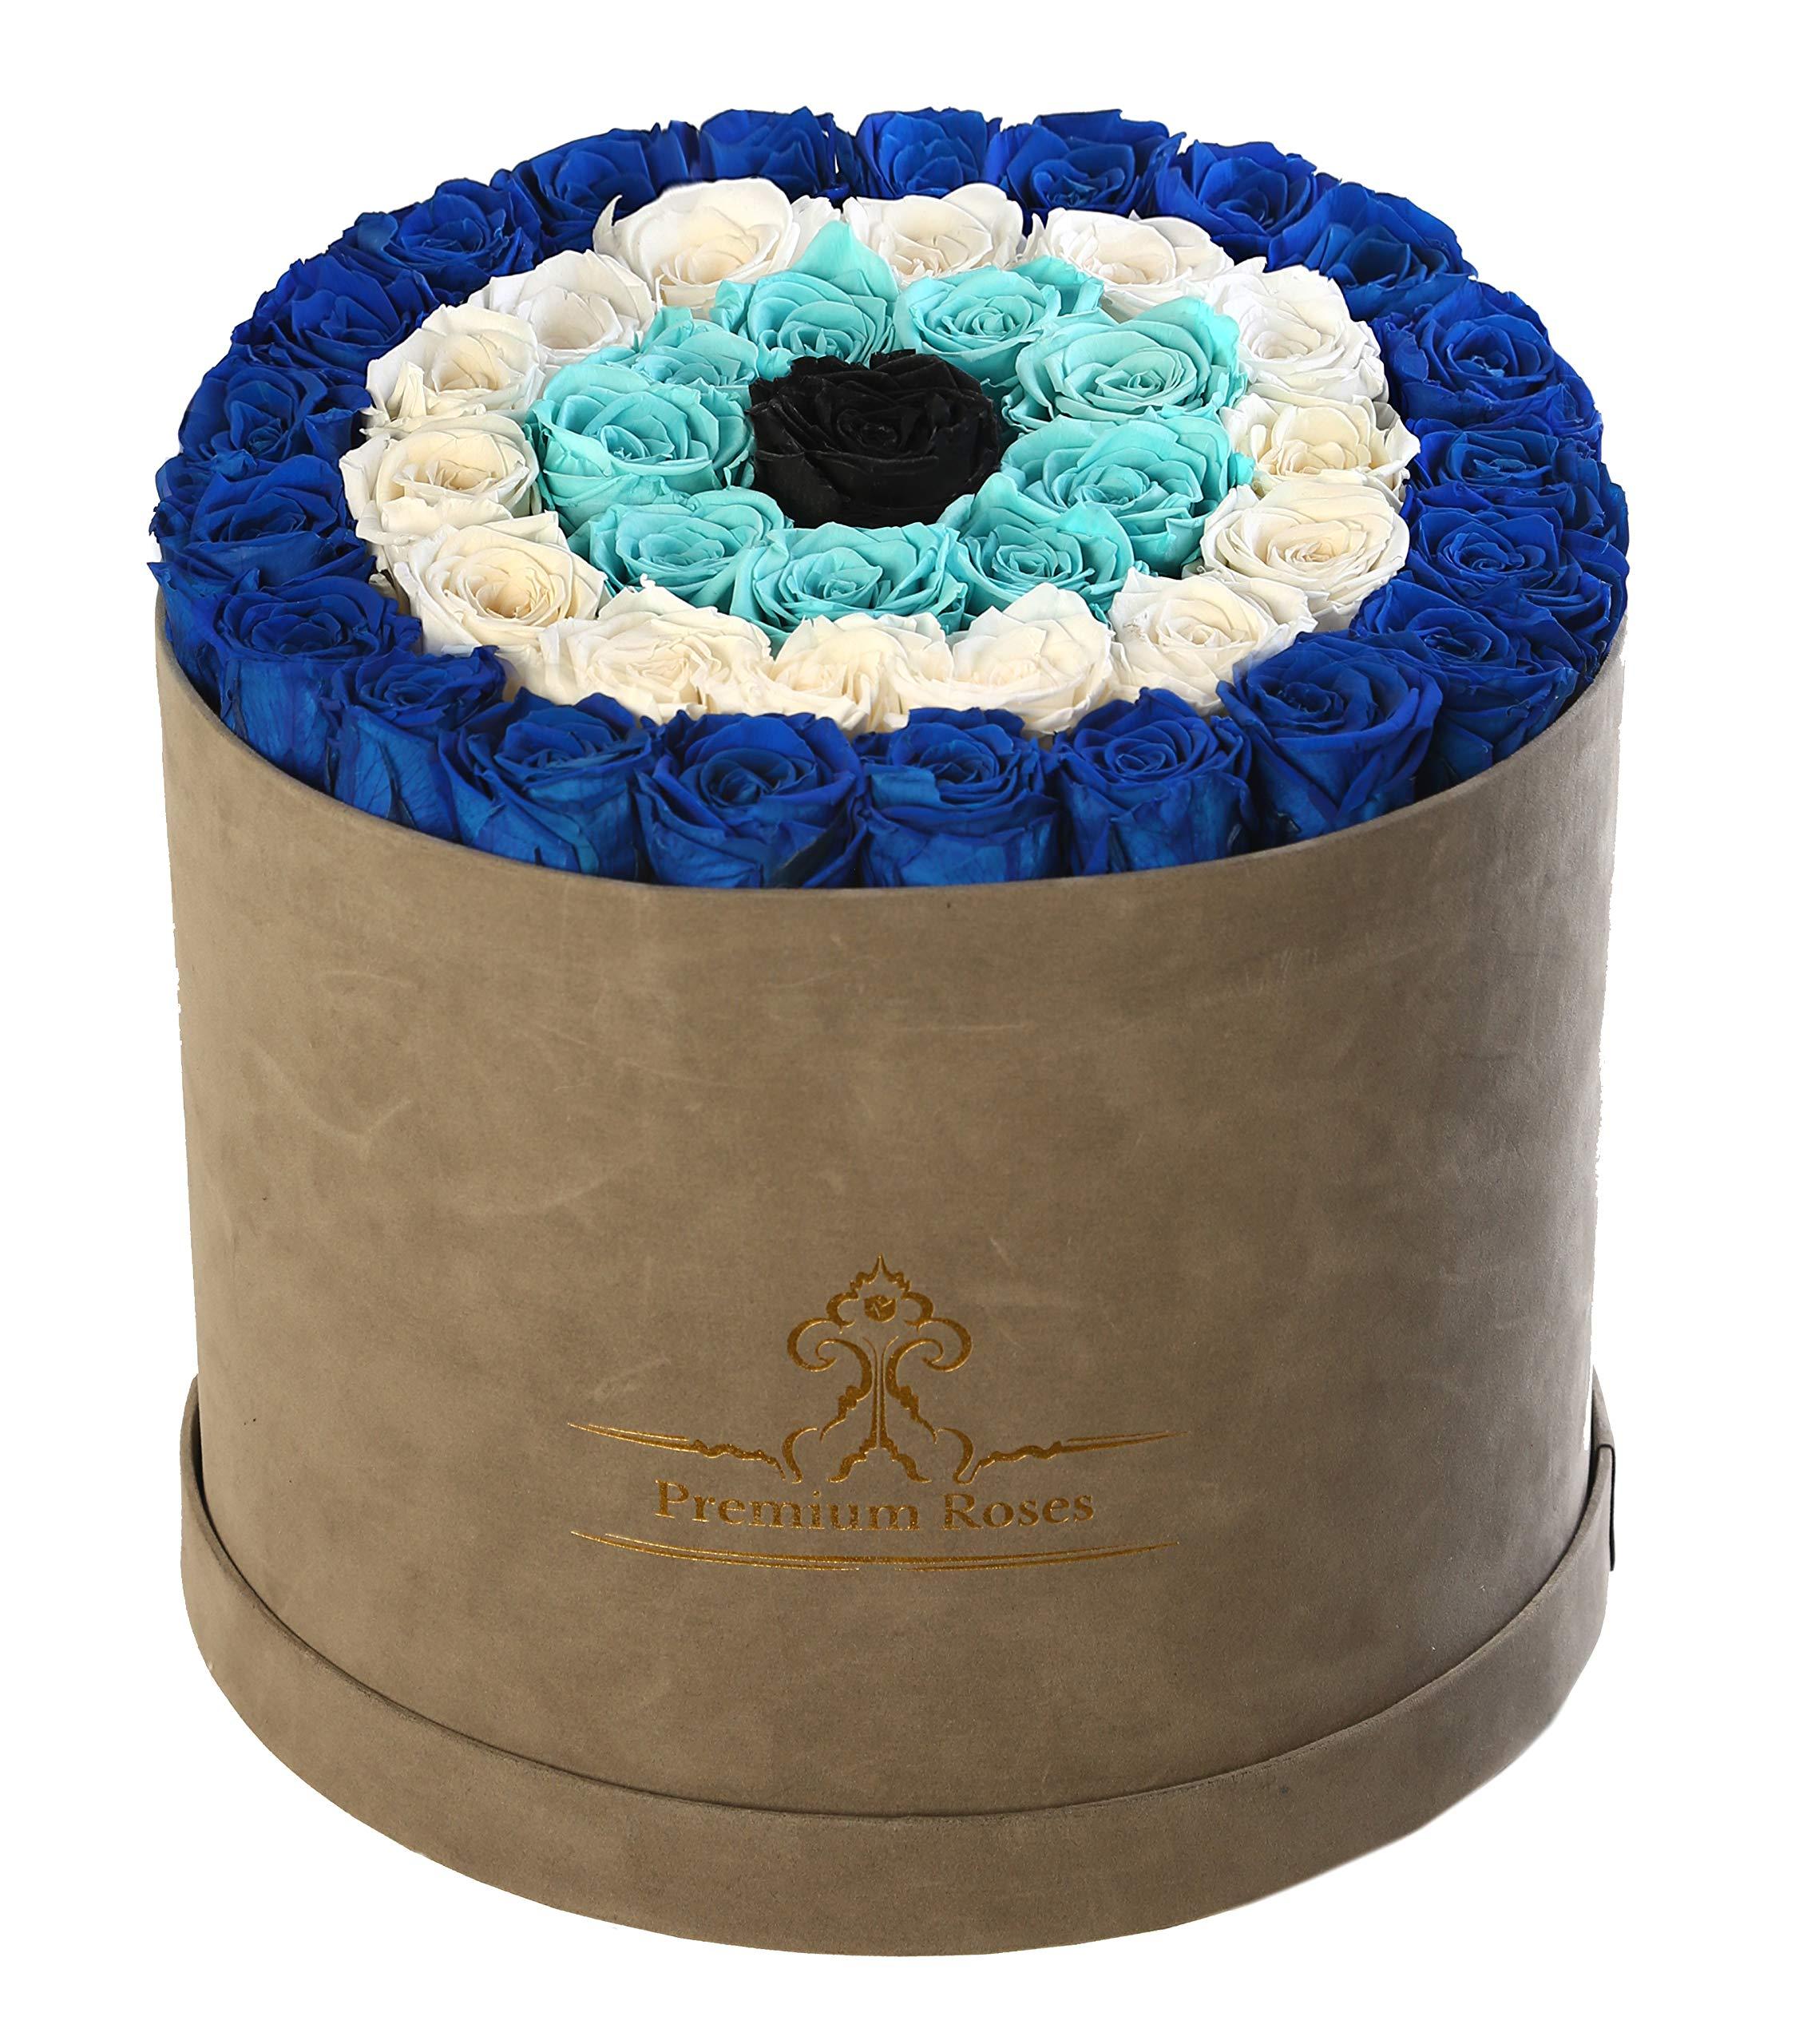 Premium Roses| Model Grey| Limited Edition| Real Roses That Last 365 Days| Fresh Flowers (Gray Velvet Box, Large)